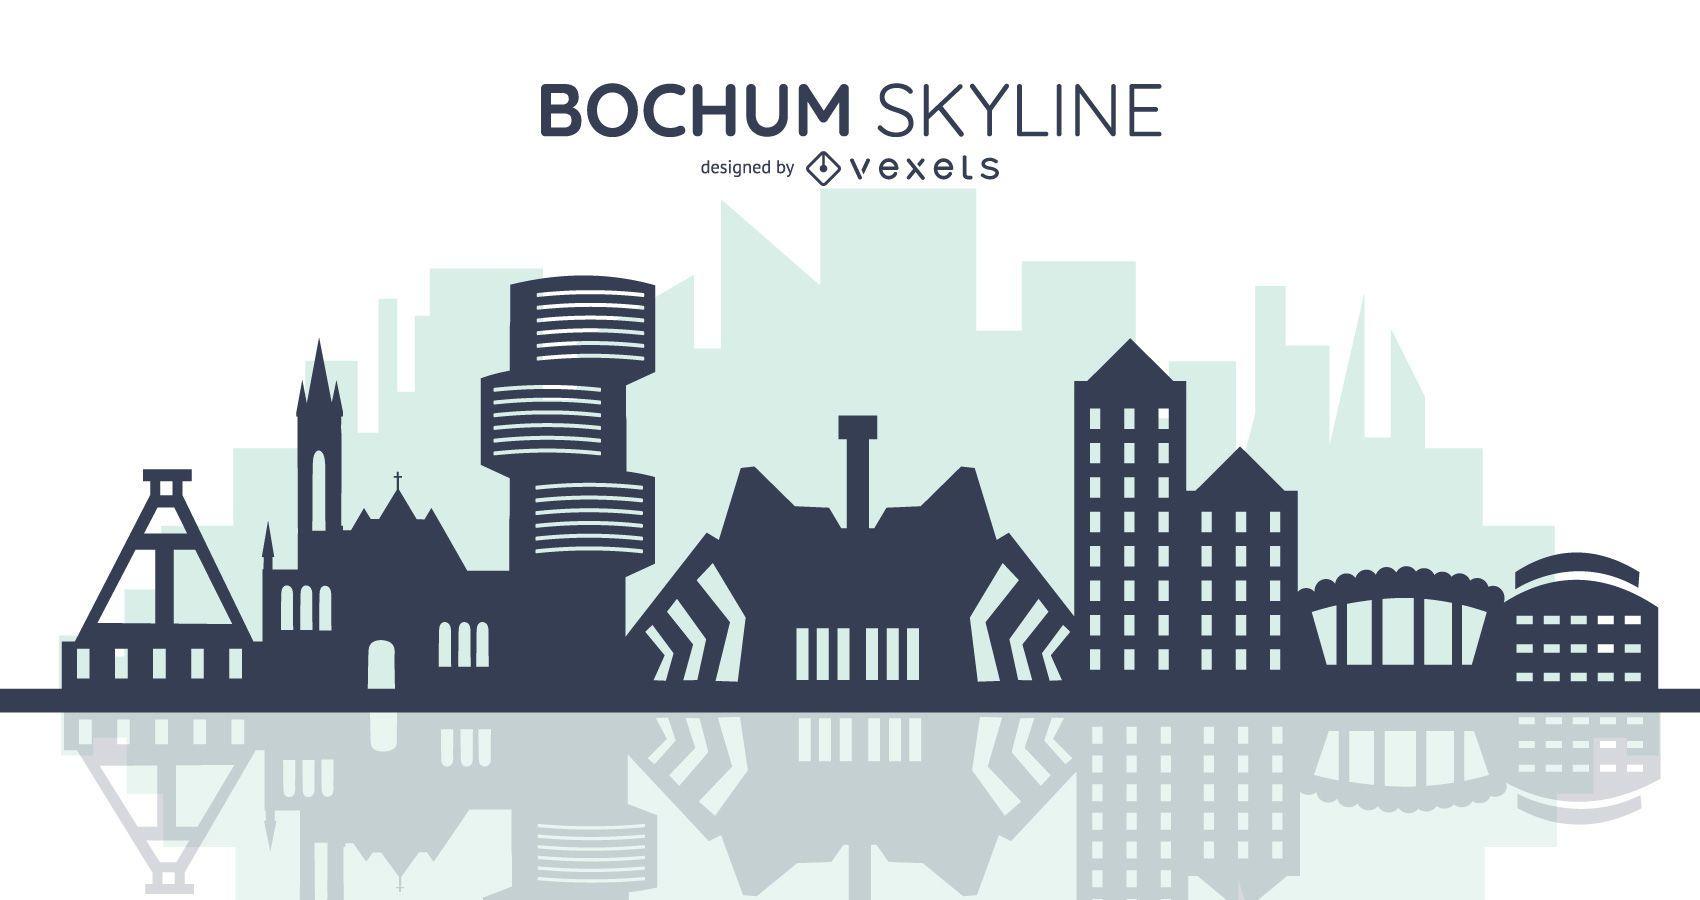 bochum skyline silhouette